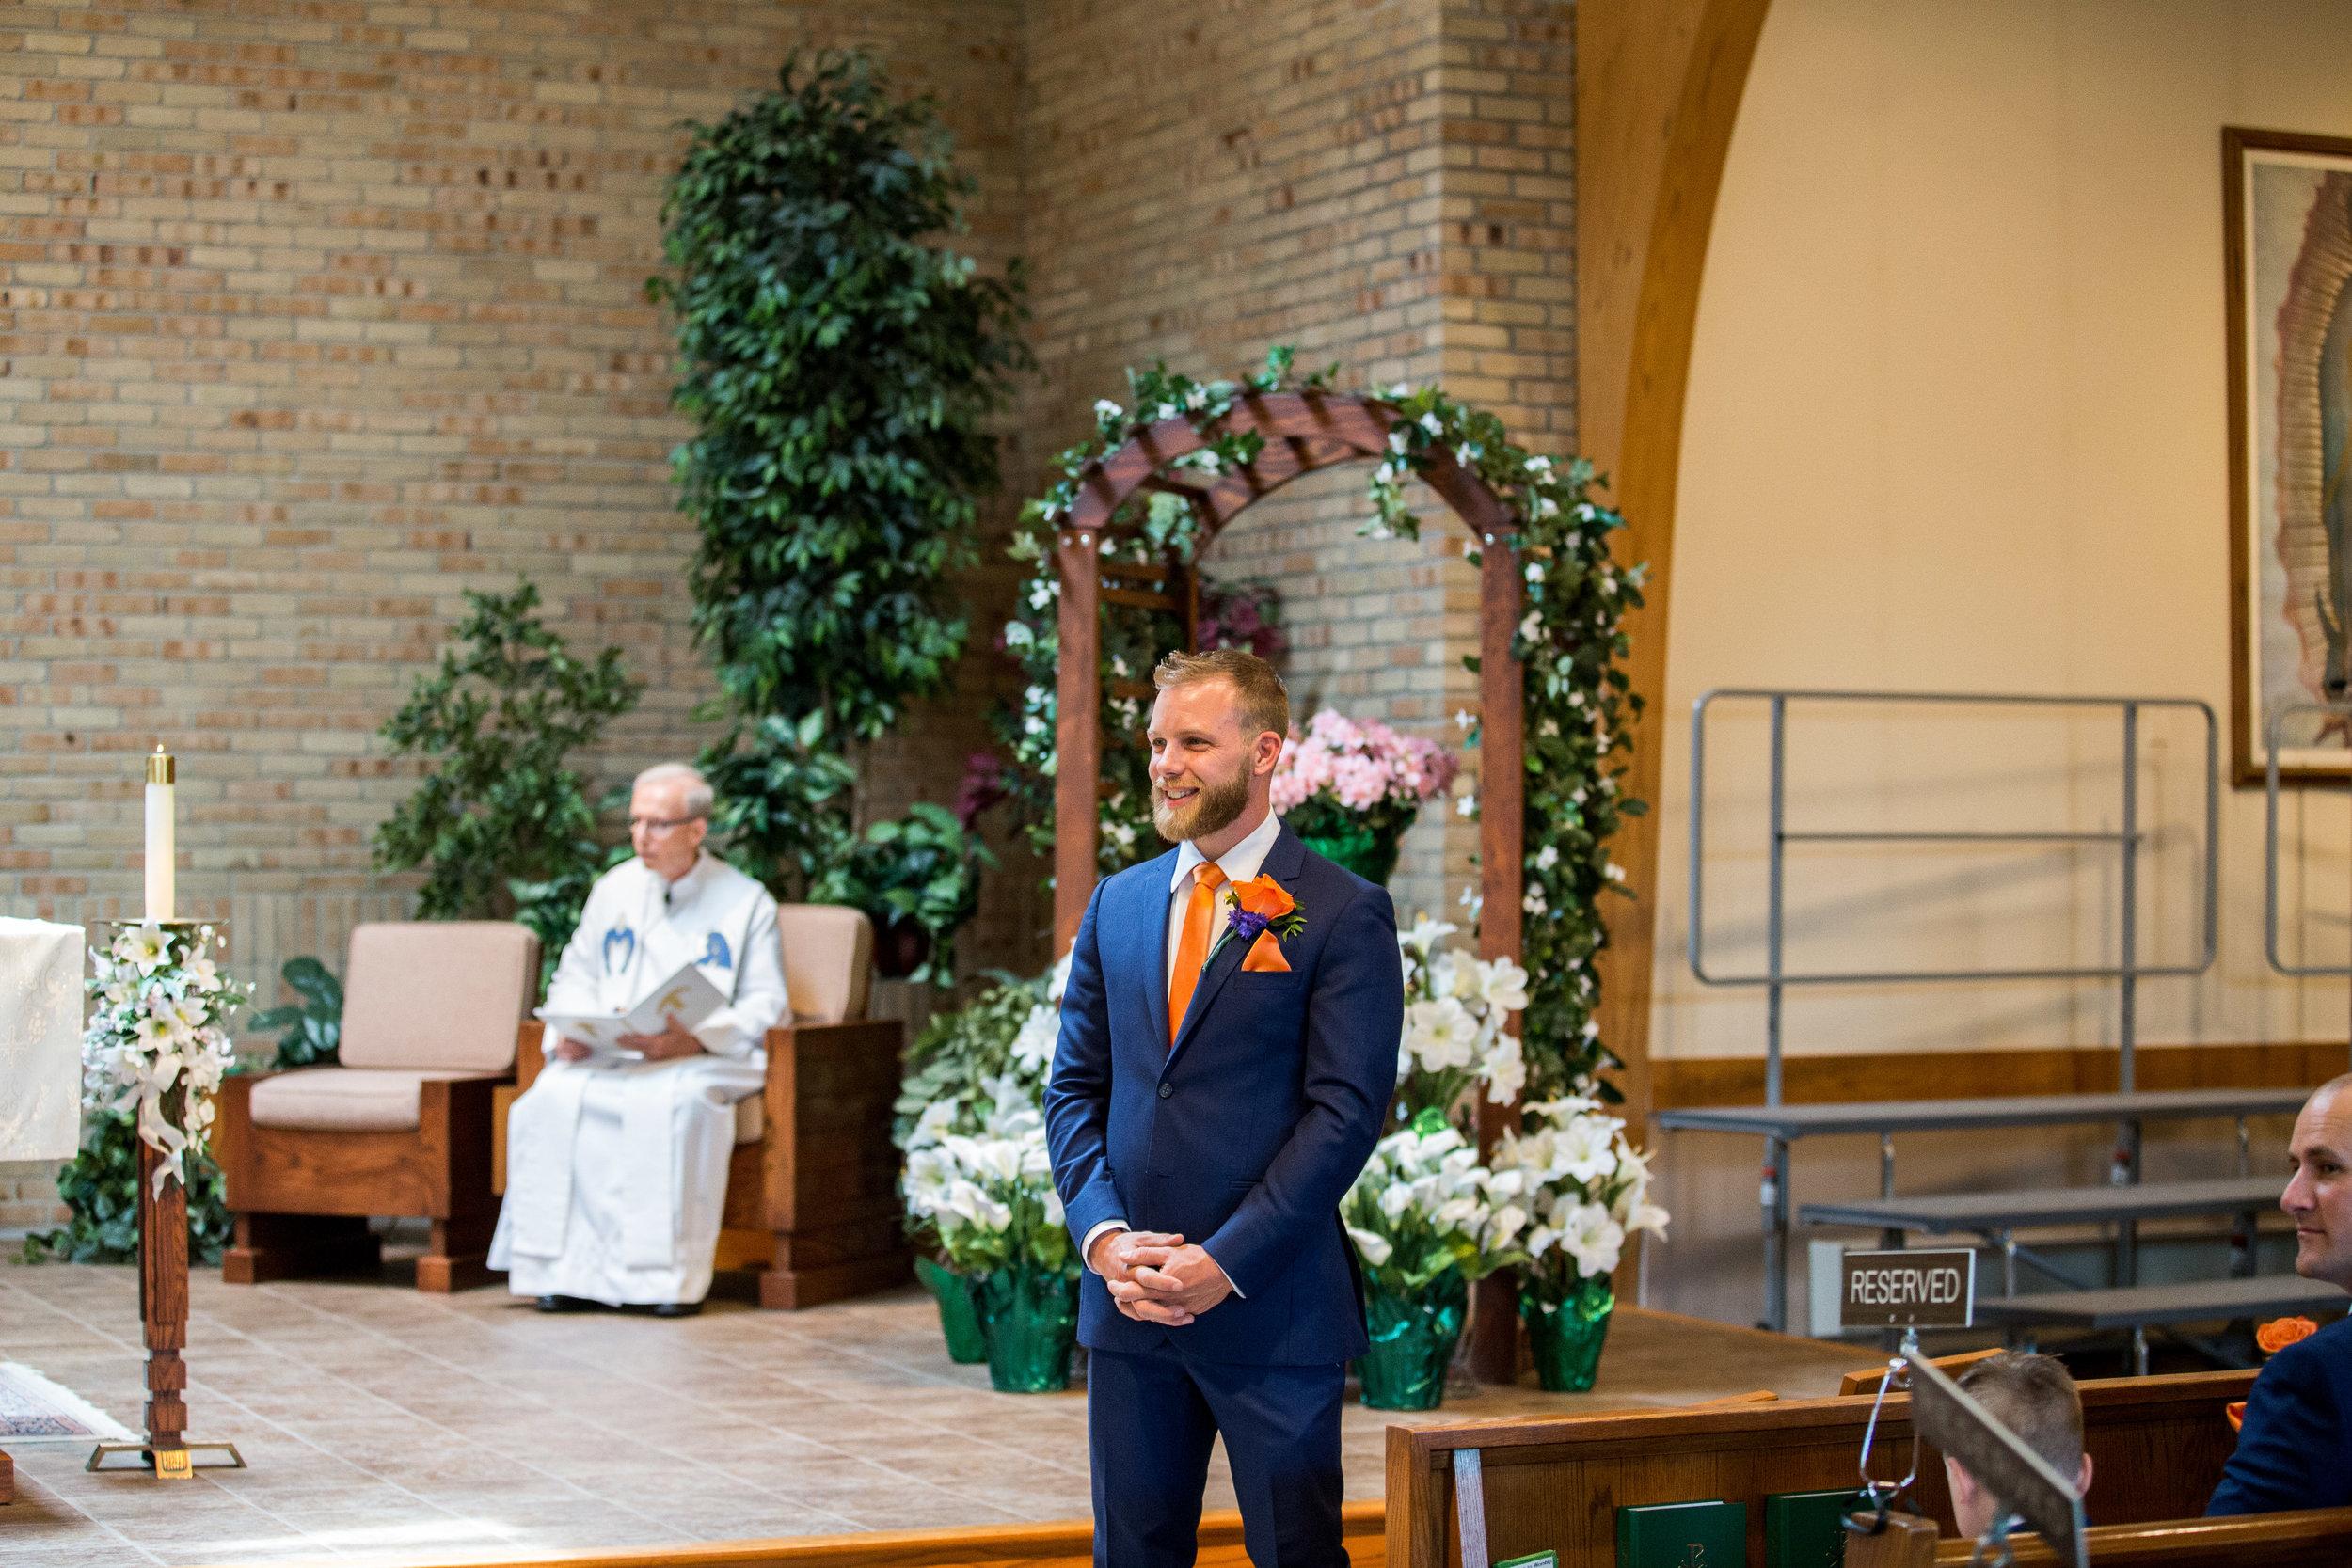 Natalie and Dallas Mooney Wedding 6-8-19_Tania Watt Photography-67.jpg